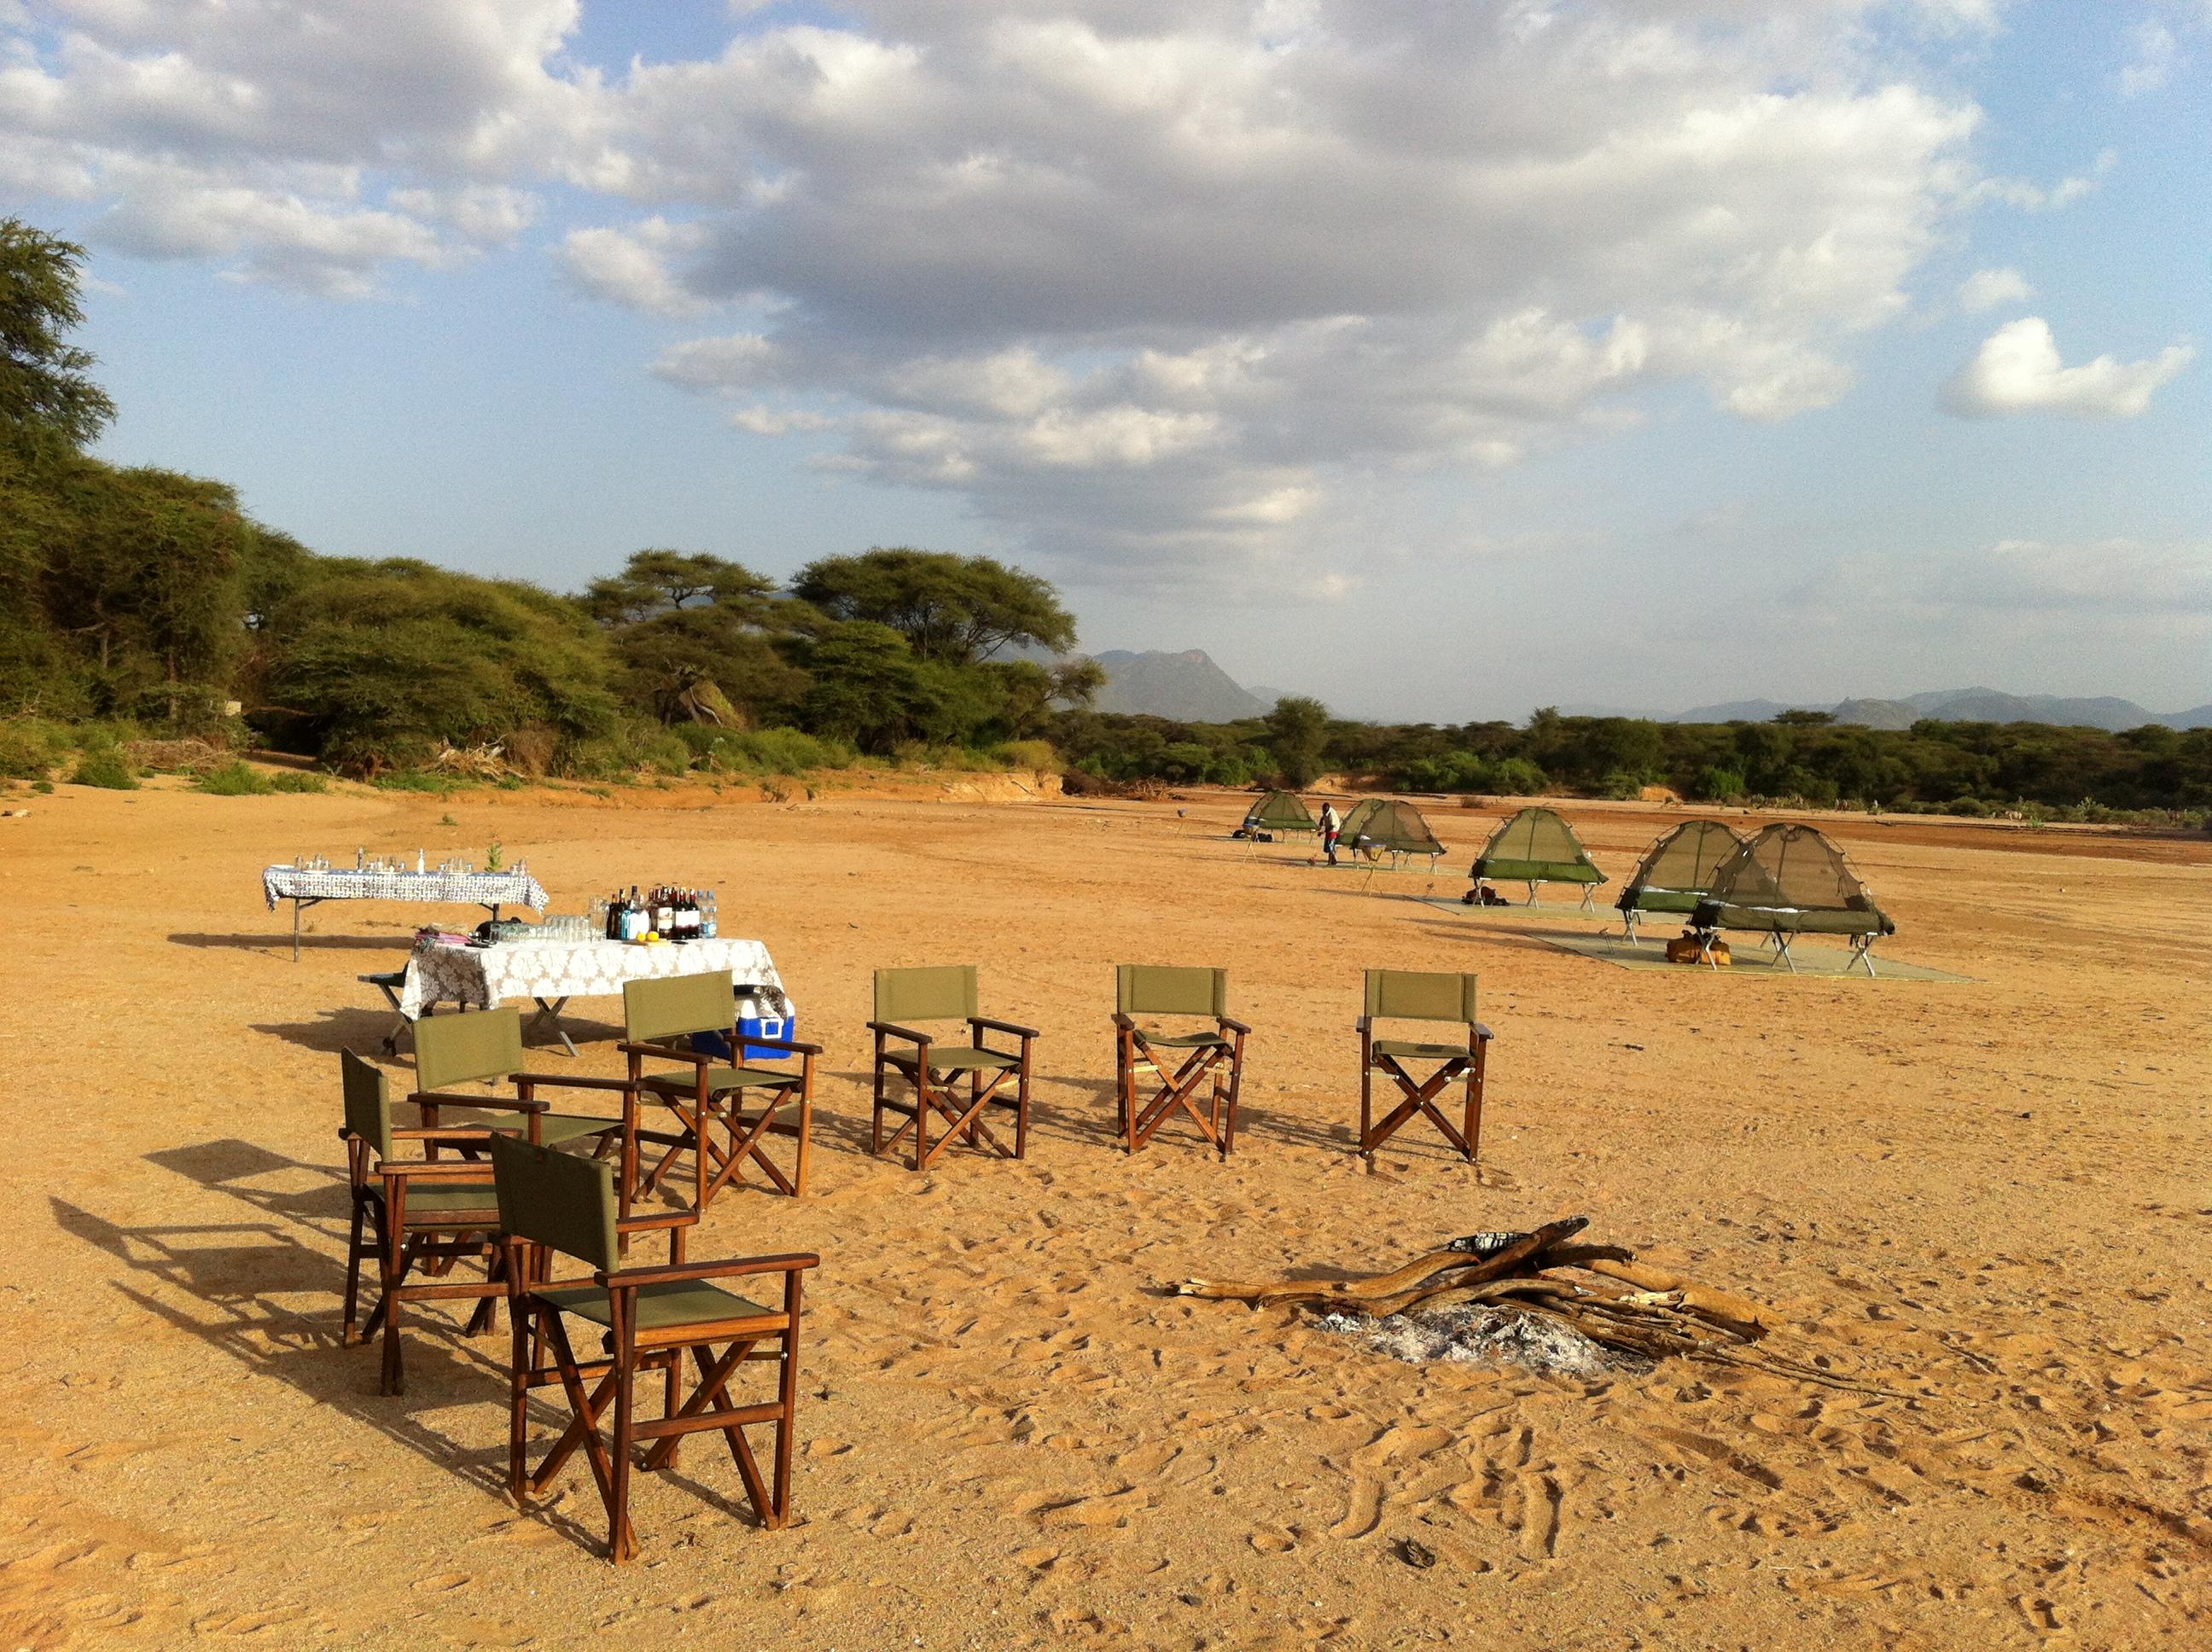 Lattitude Kenya Communal Area